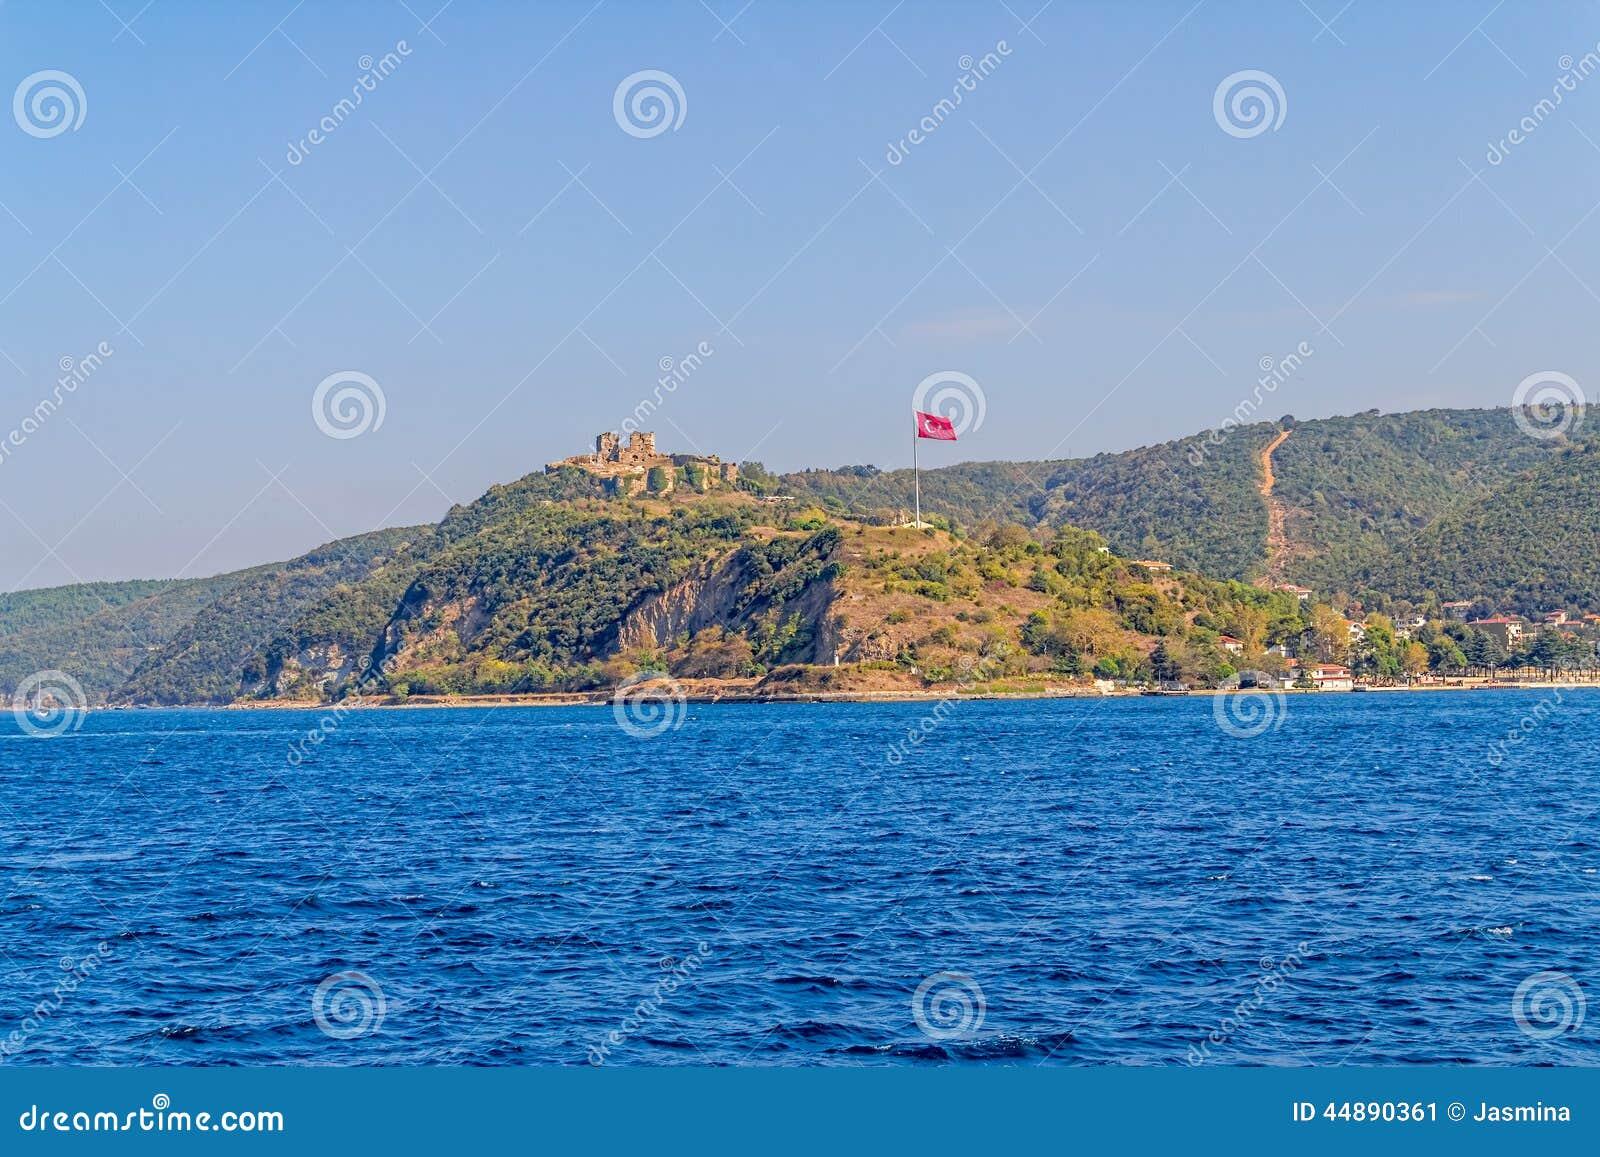 Anadolu Kavagi Stock Photo - Image: 44890361